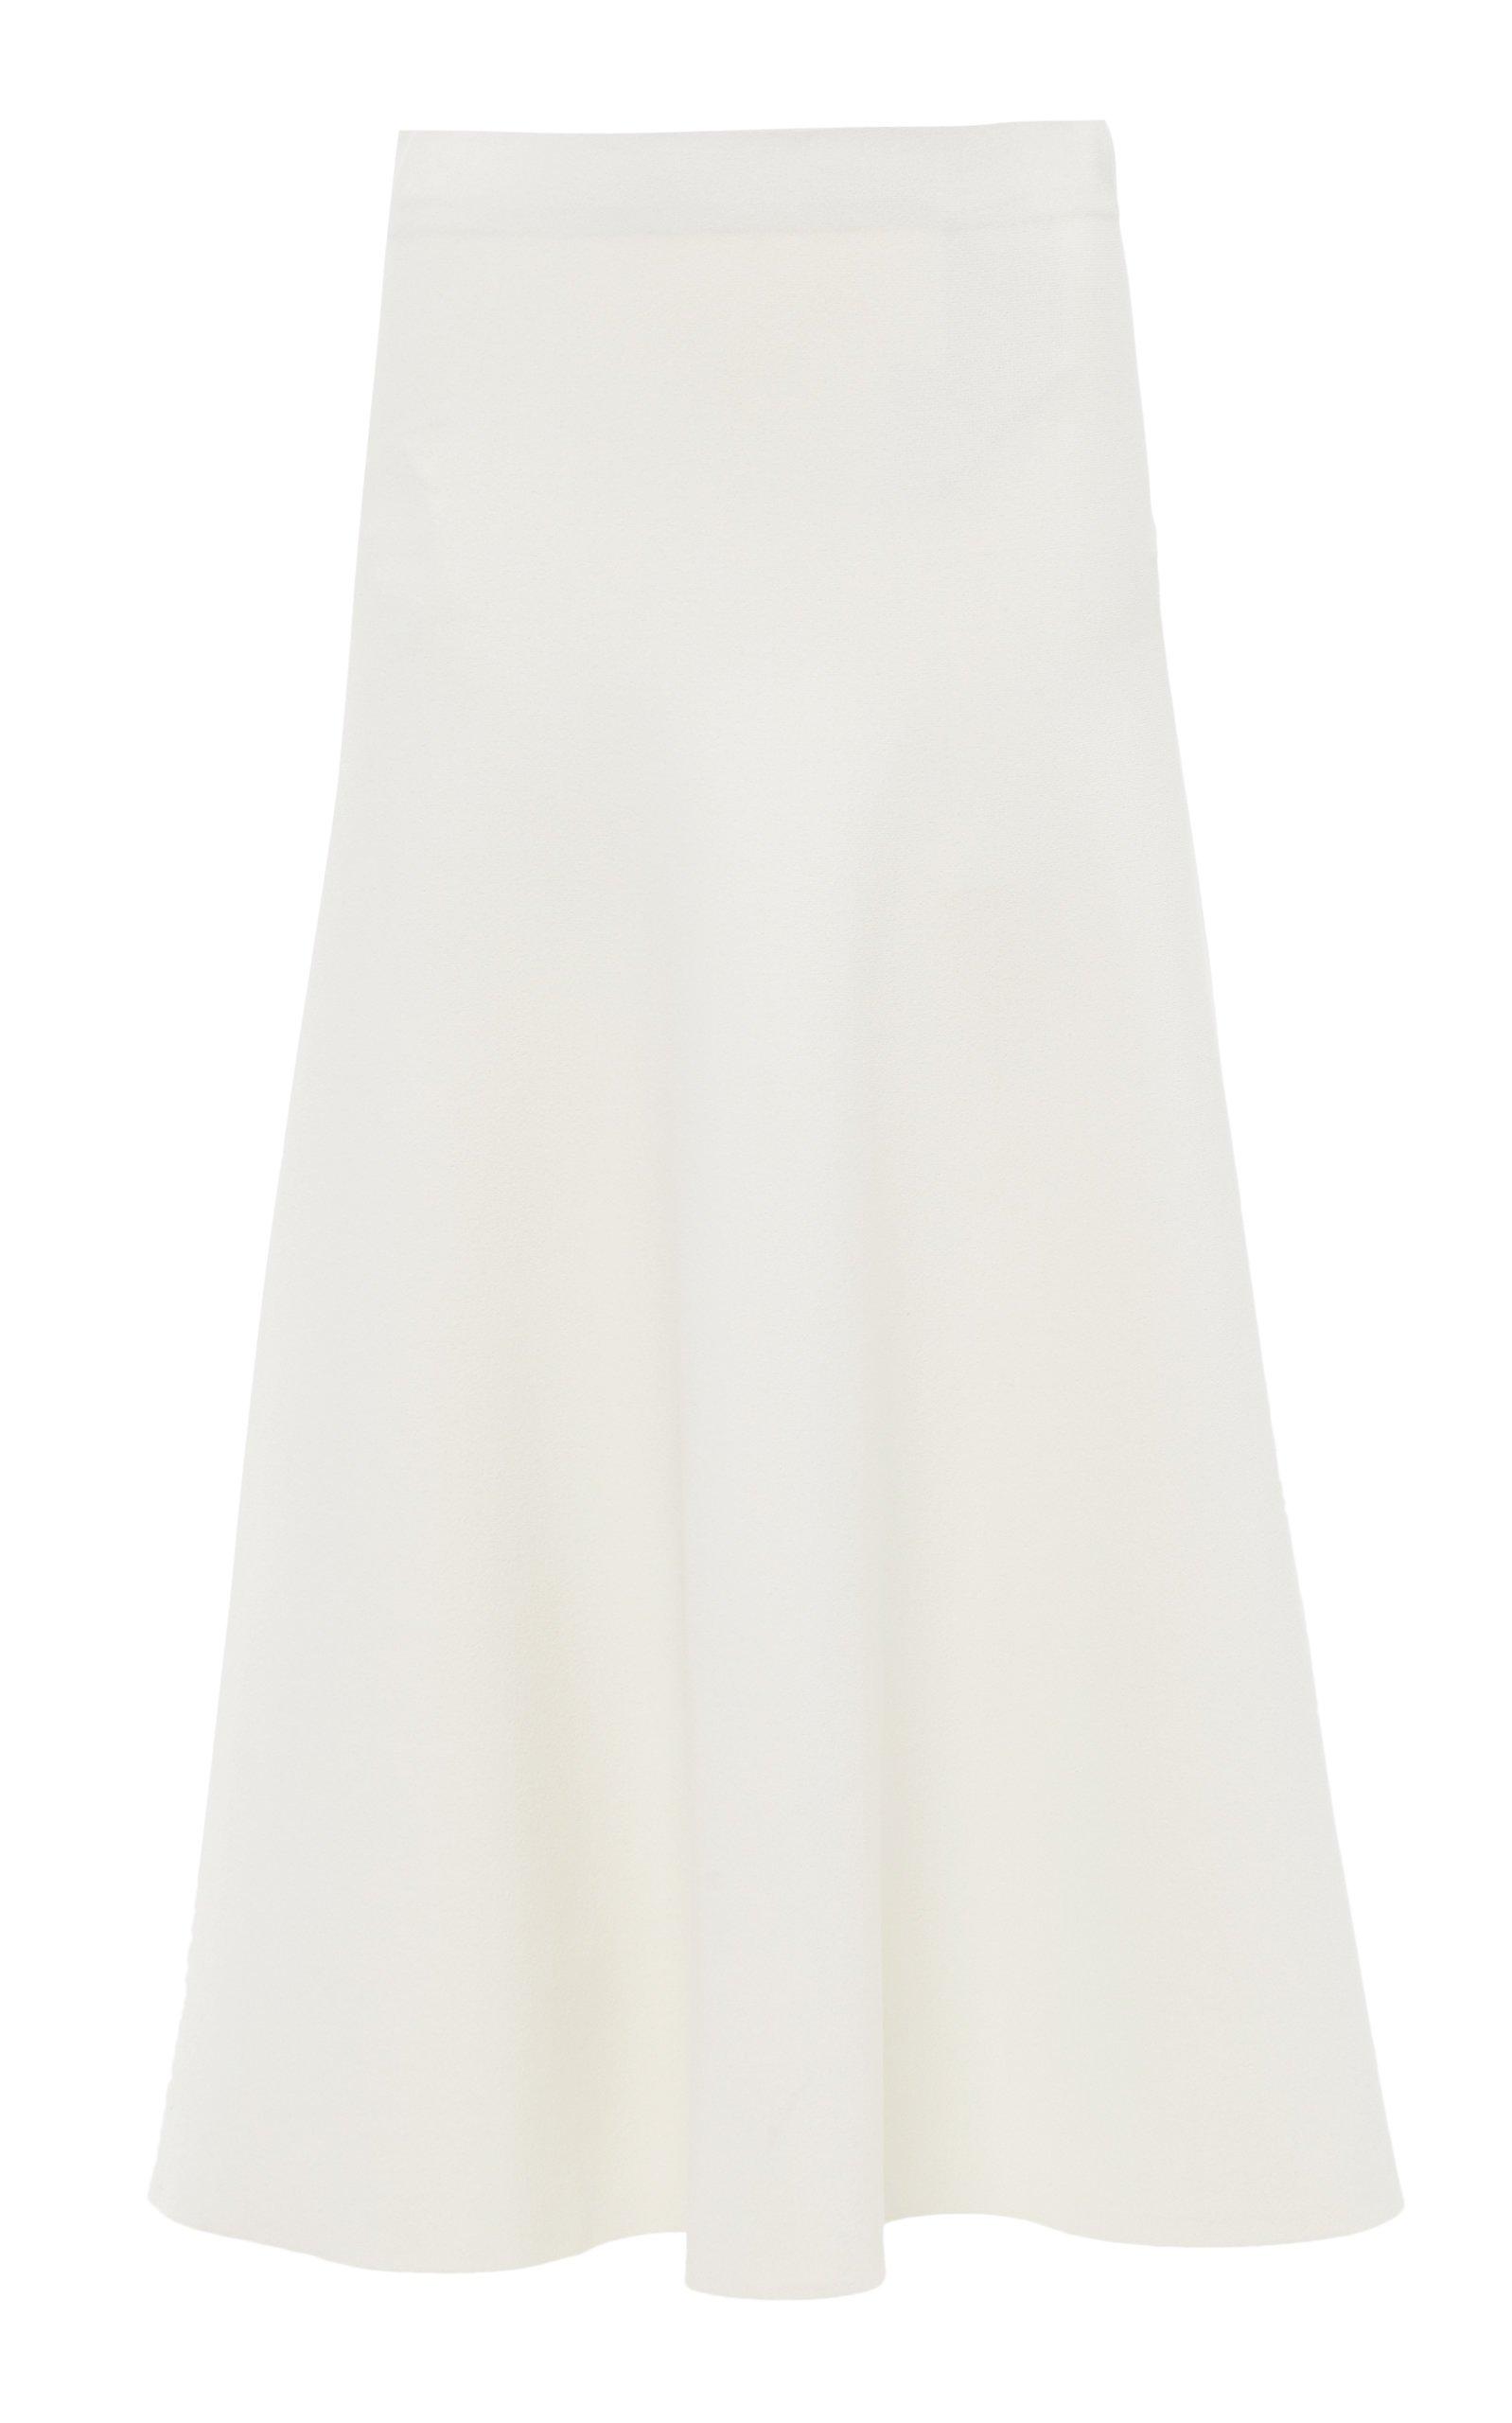 Jil Sander Crepe Midi Skirt Size: 36